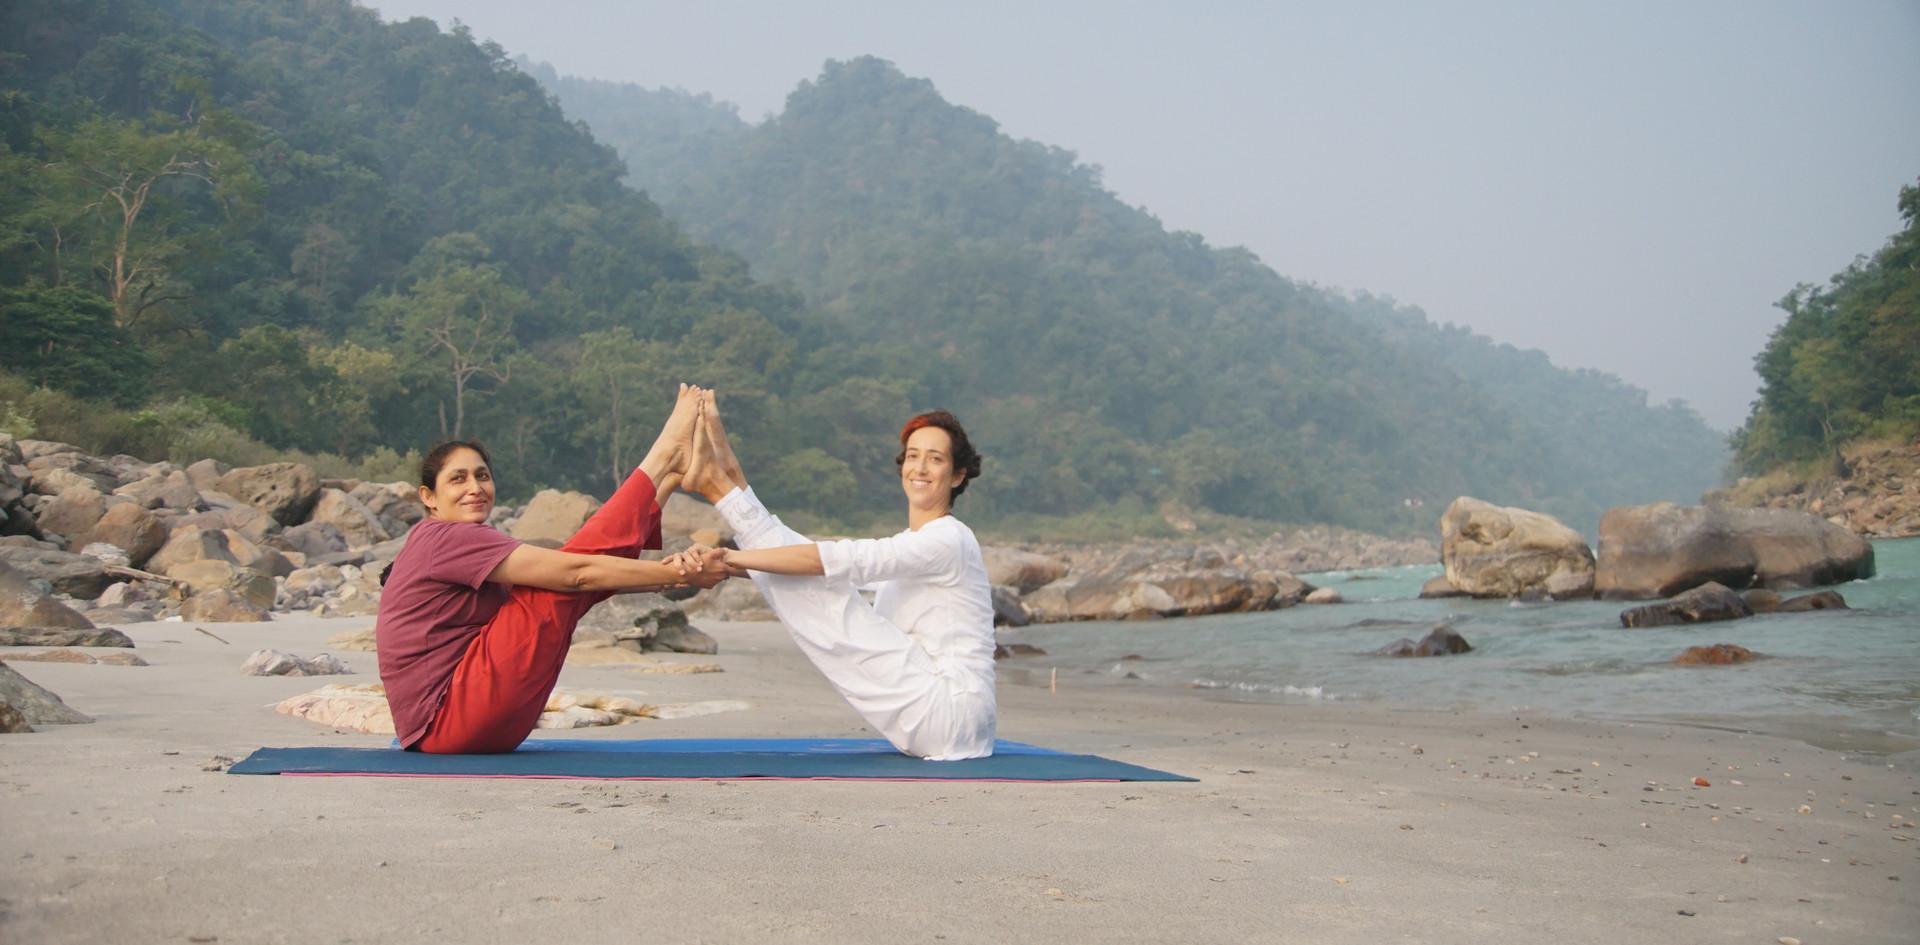 Yoga Asanas at the shores of the holy river Ganga